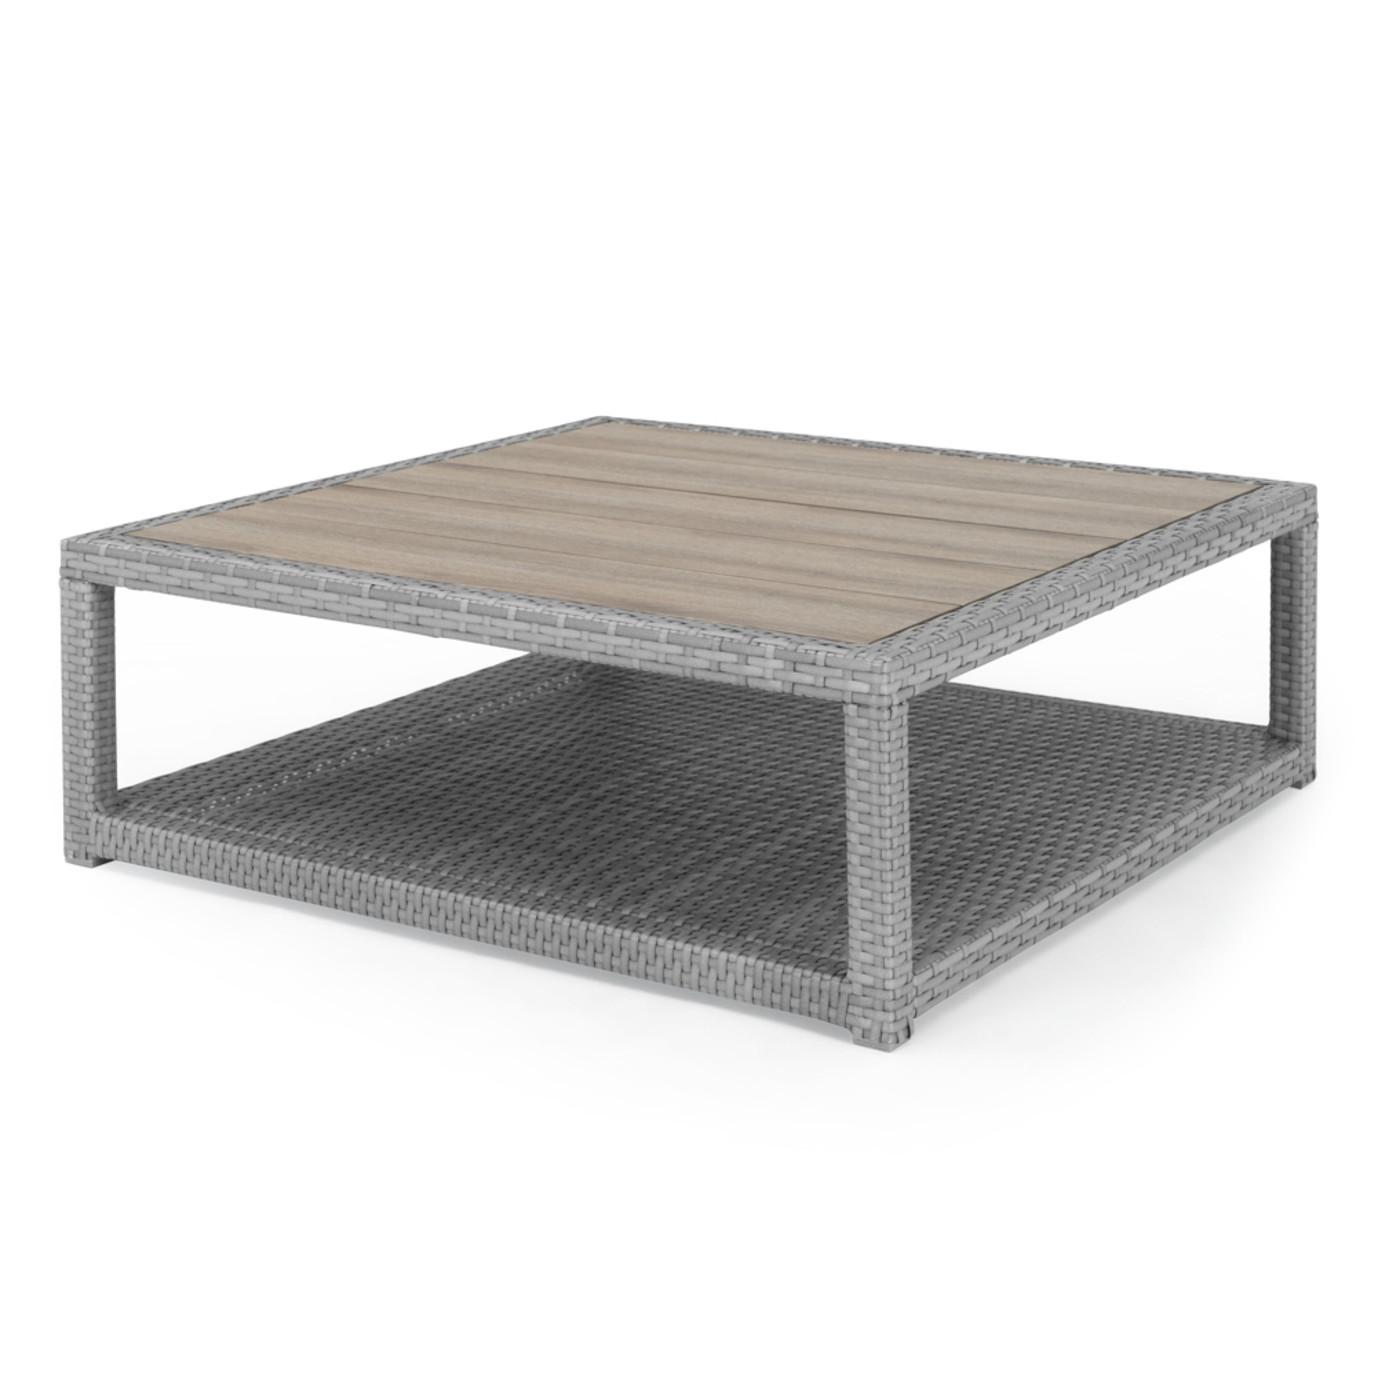 Portofino® Comfort Faux Wood Conversation Table - Gray